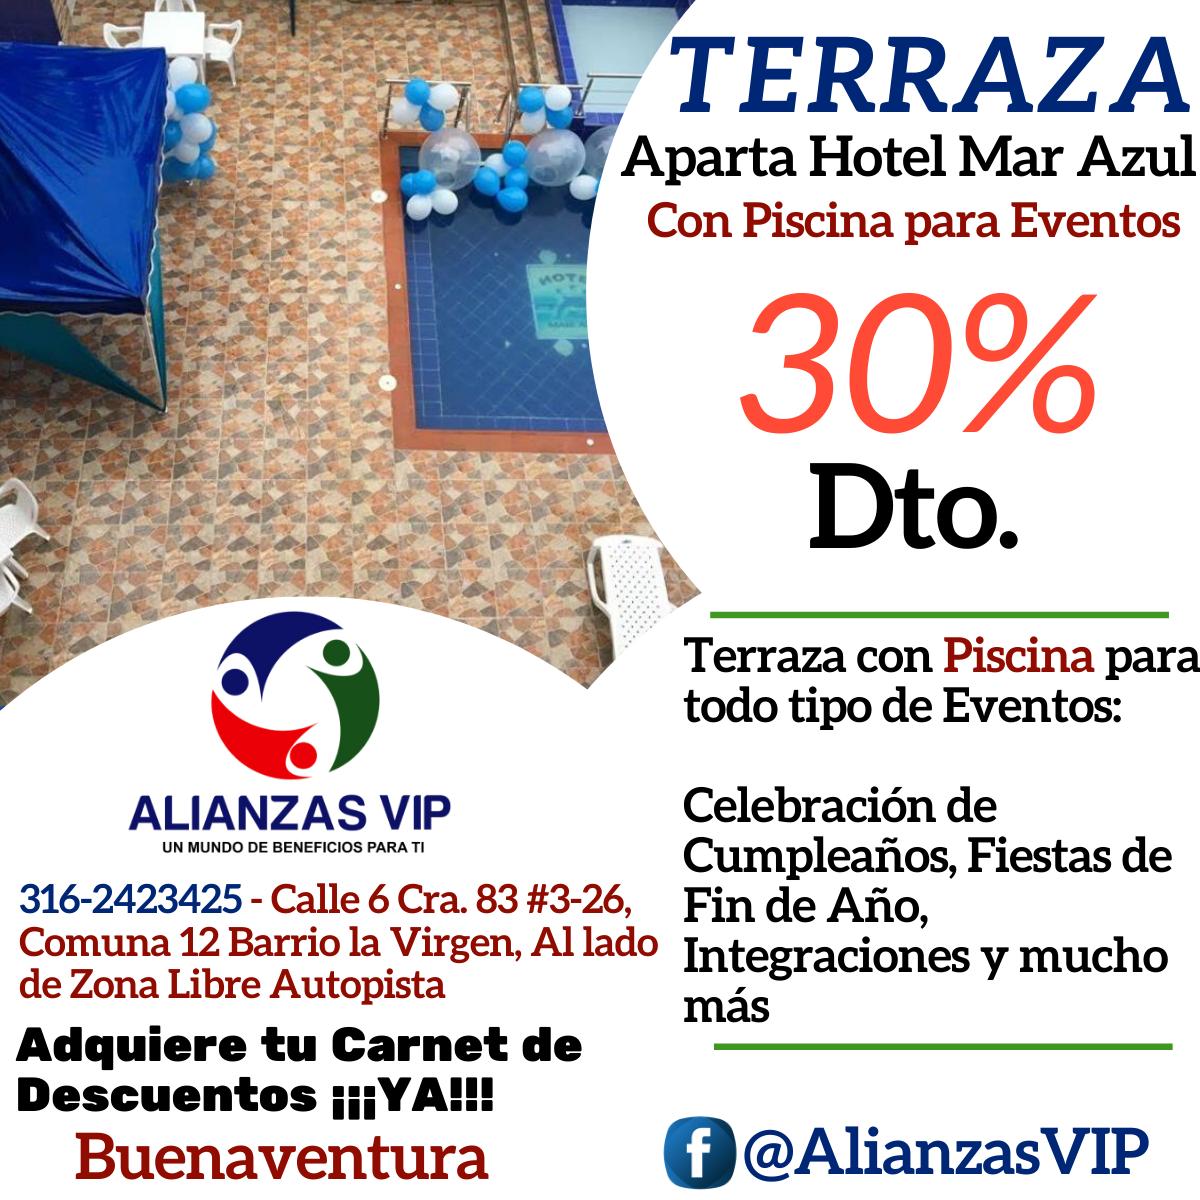 Terraza Aparta Hotel Mar Azul Un 30 Dto